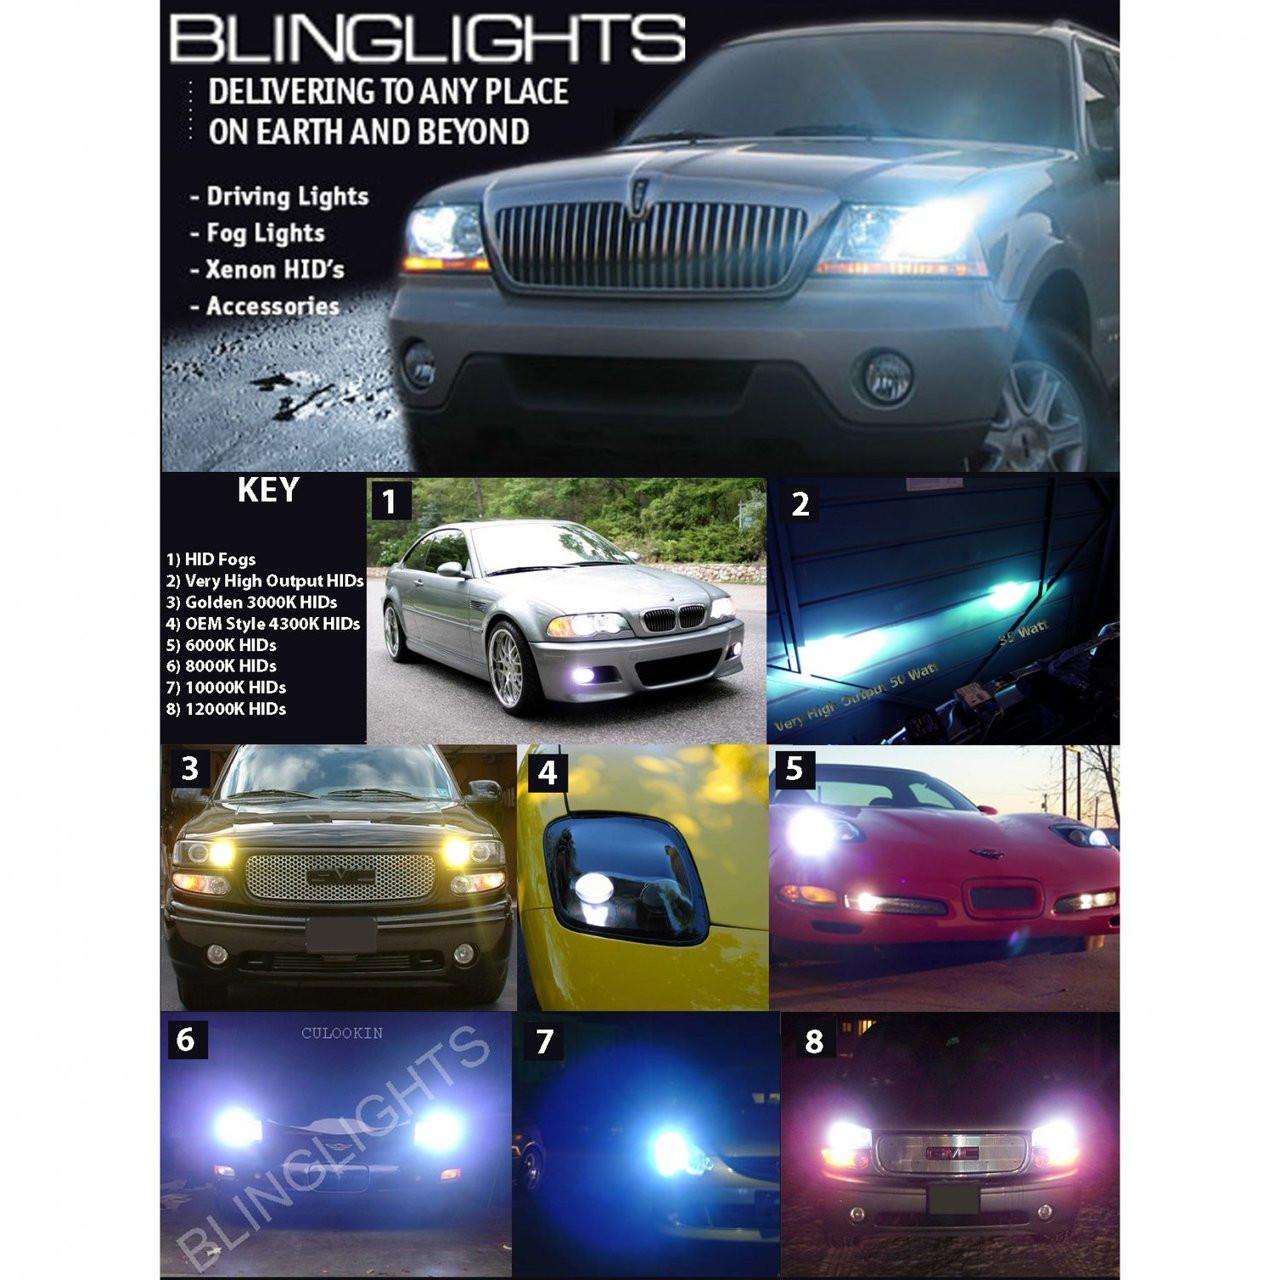 2005 2006 2007 2008 Toyota Tacoma Xenon HID Conversion Kit for Headlamps Headlights Head Lamp Lights